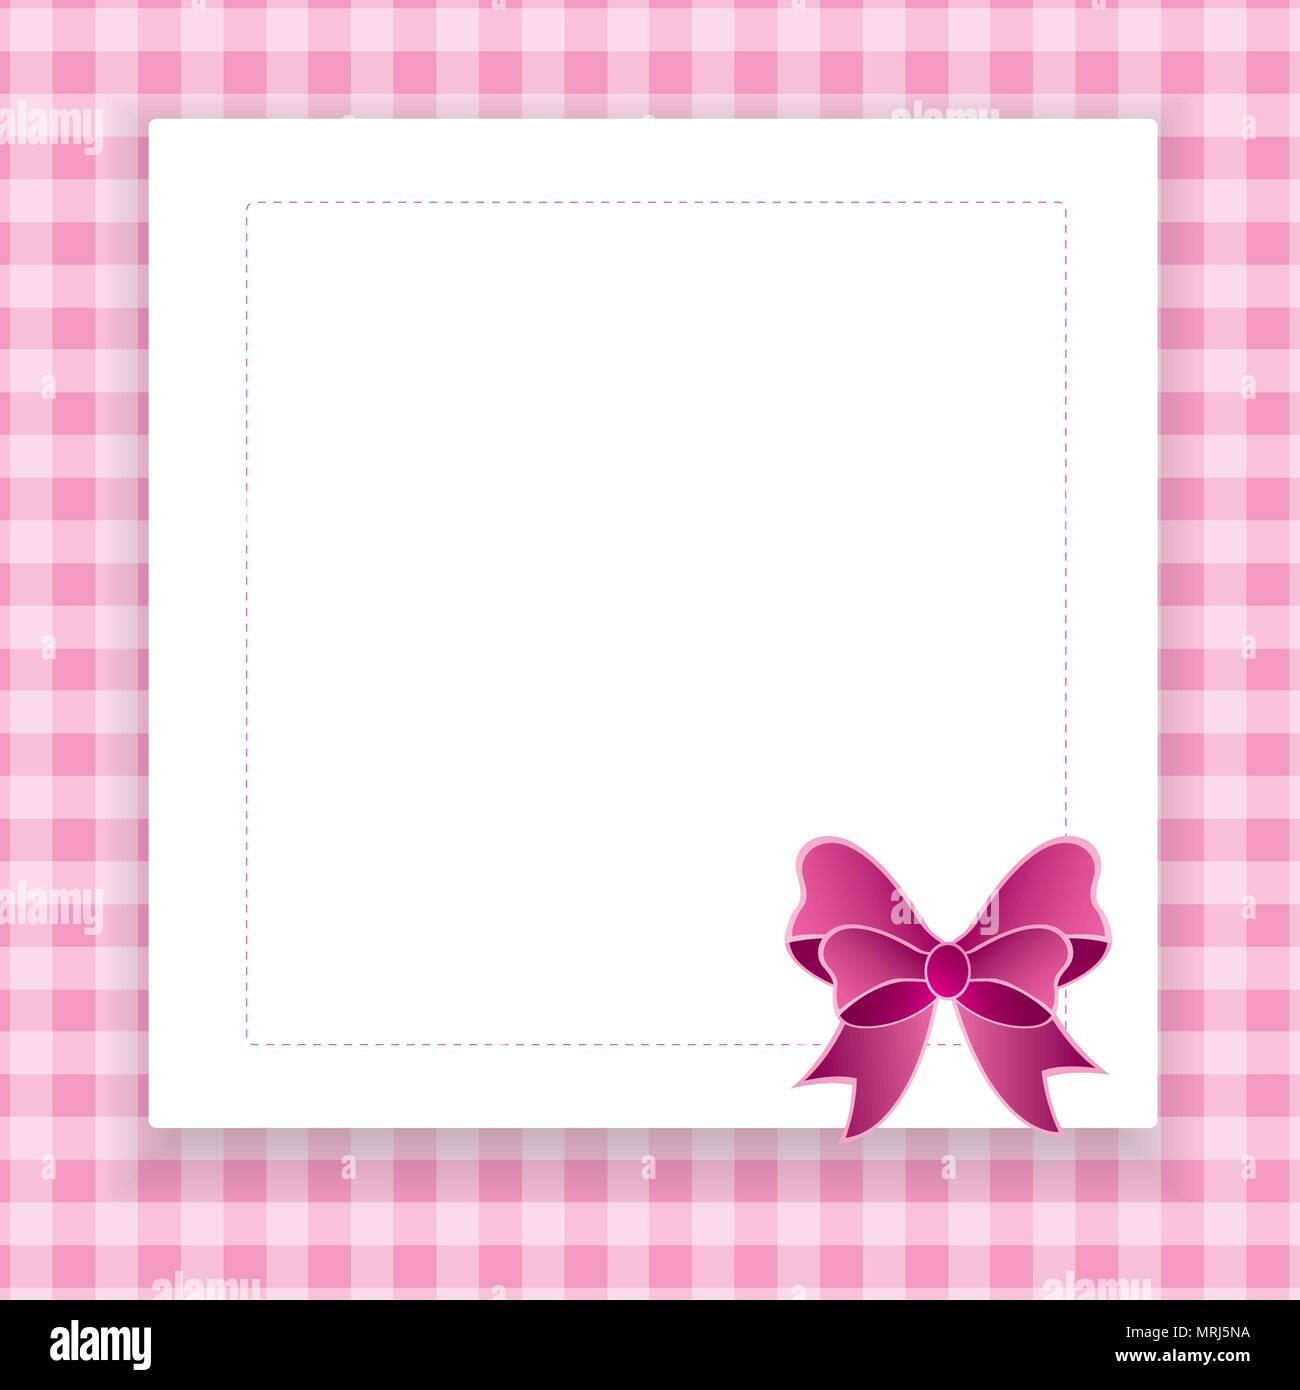 Vector Rosa Tarjeta De Invitación Para Baby Shower Boda O